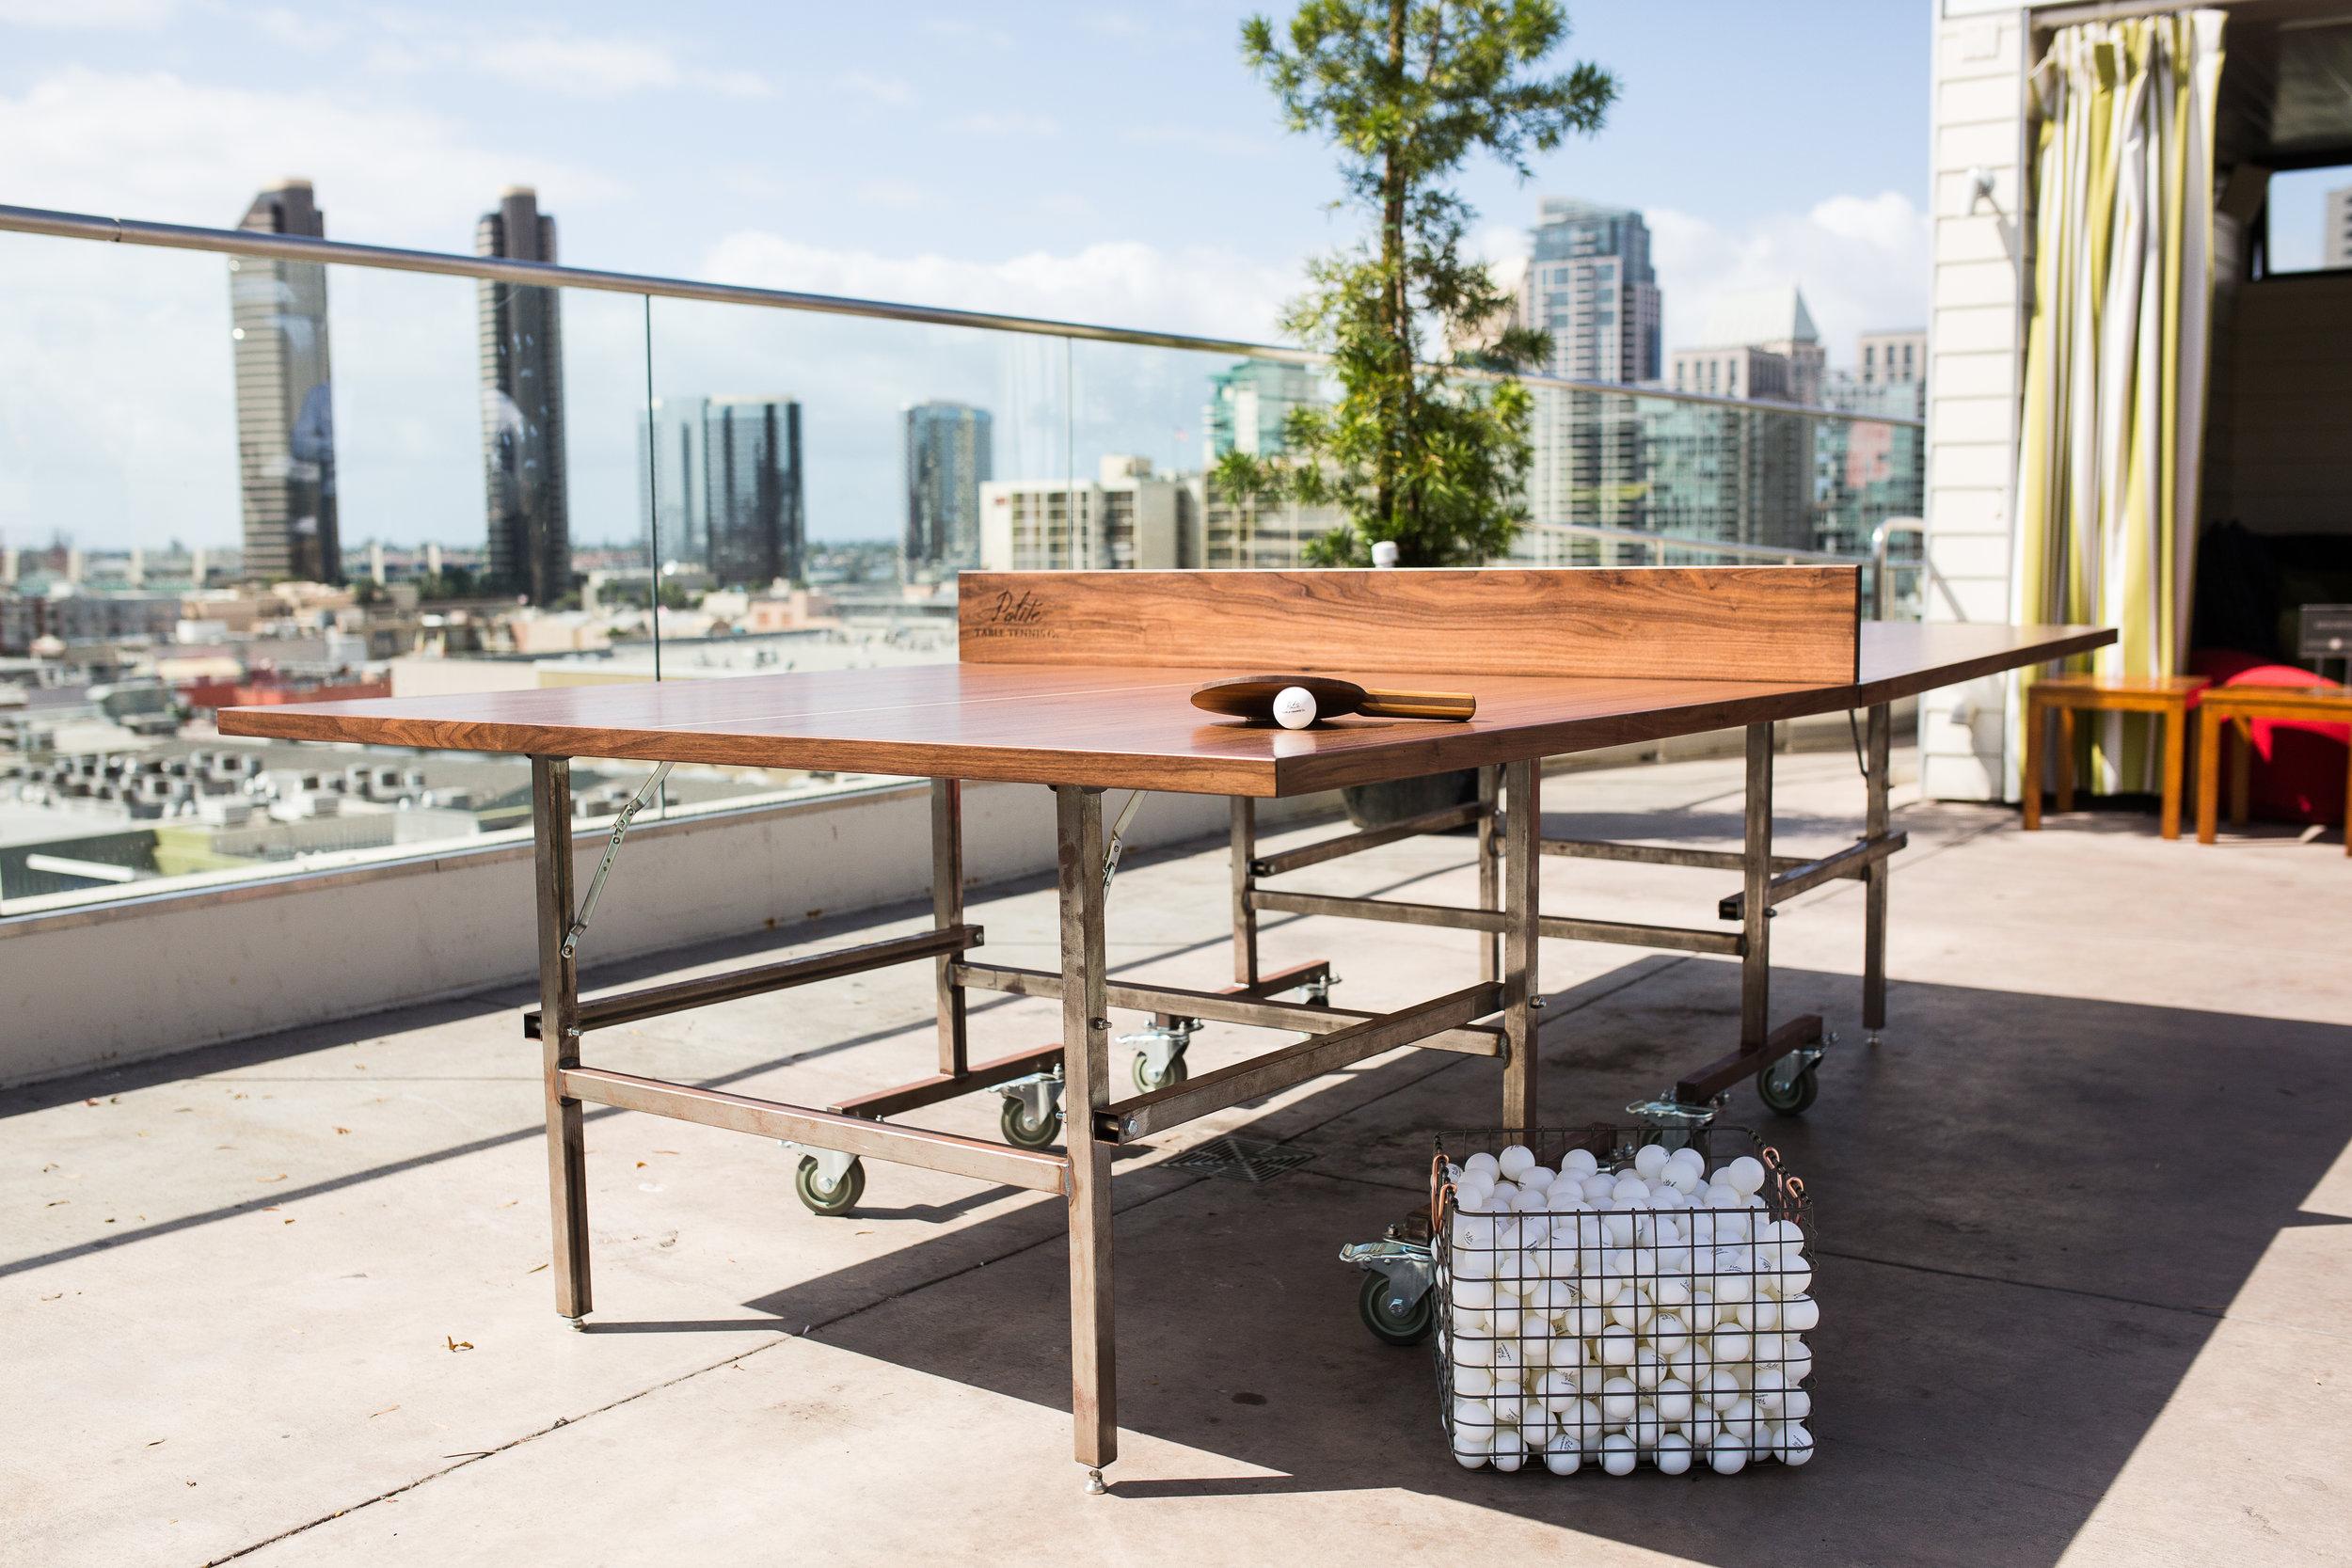 20170922_Polite Table Tennis-0019.jpg